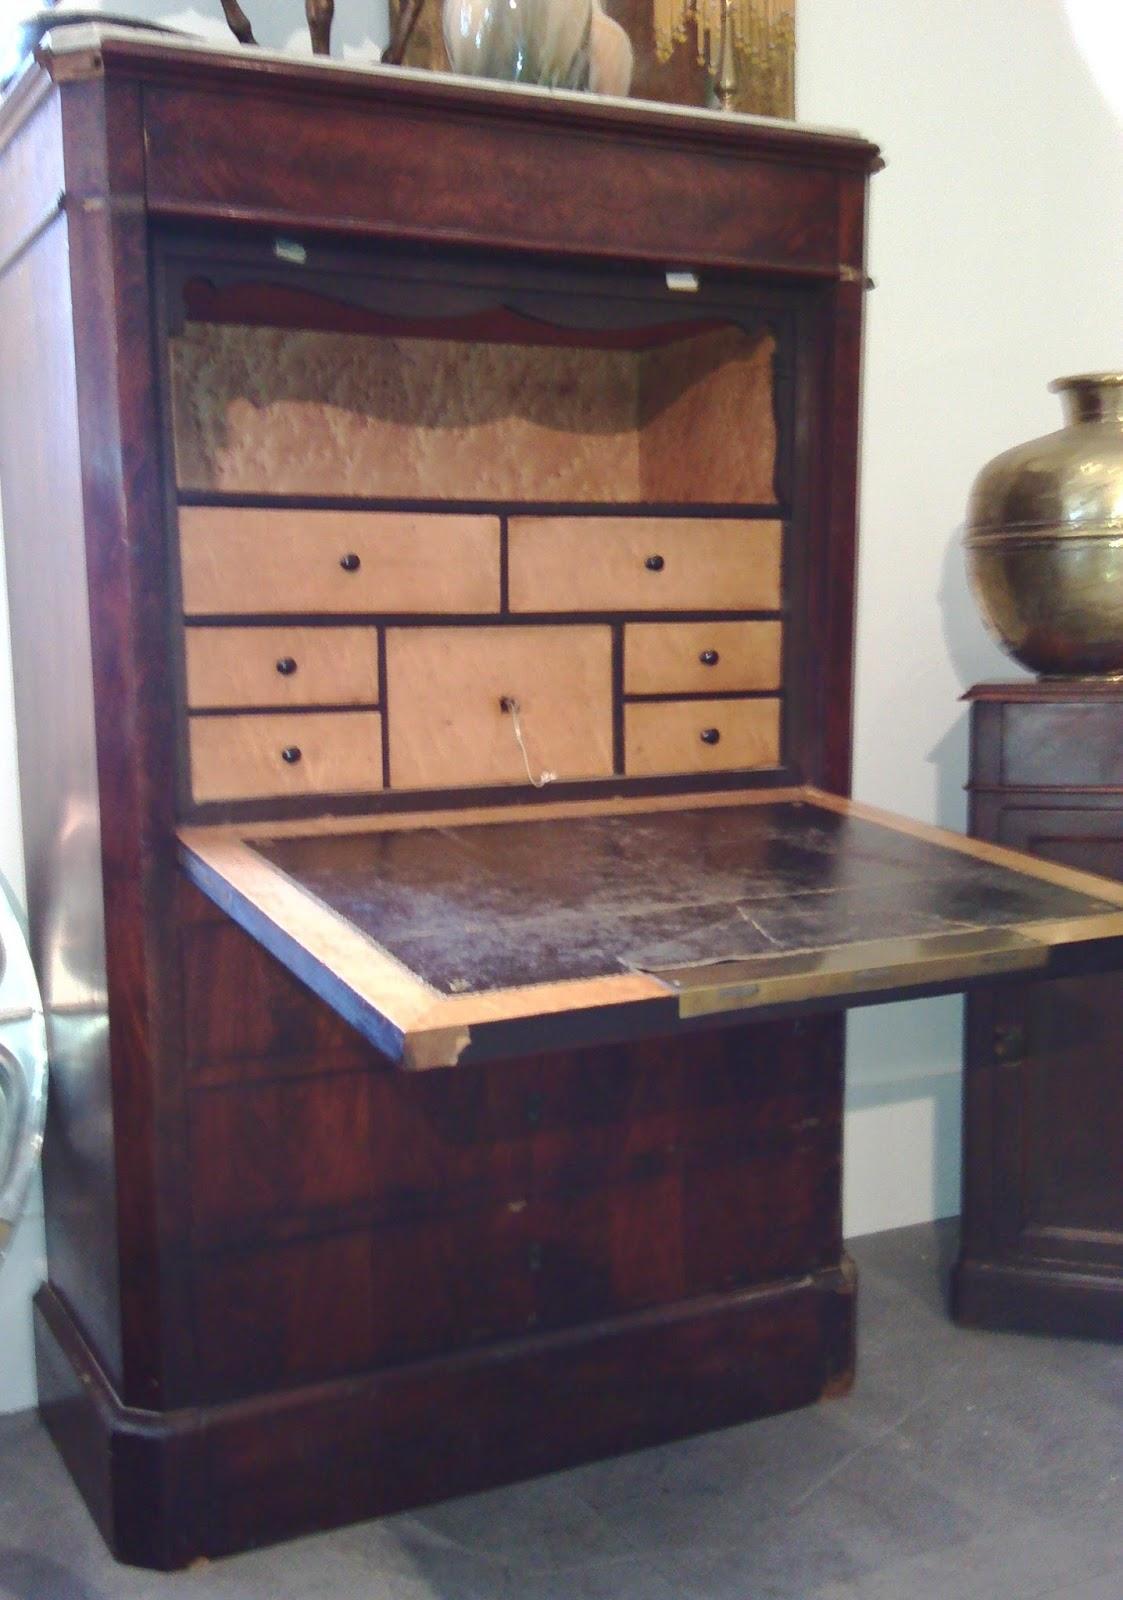 ancien secr taire acajou citronnier xixe napol on empire tiroirs commode secret ebay. Black Bedroom Furniture Sets. Home Design Ideas